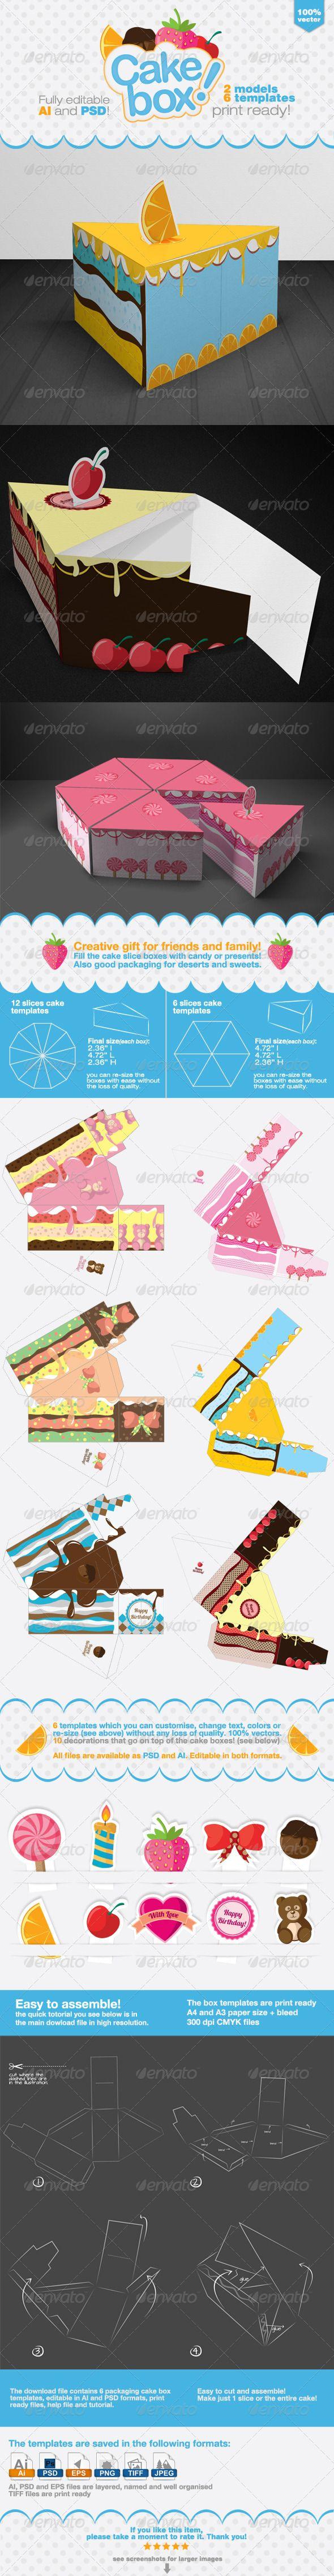 Cake Packaging Gift Box - Packaging Print Templates